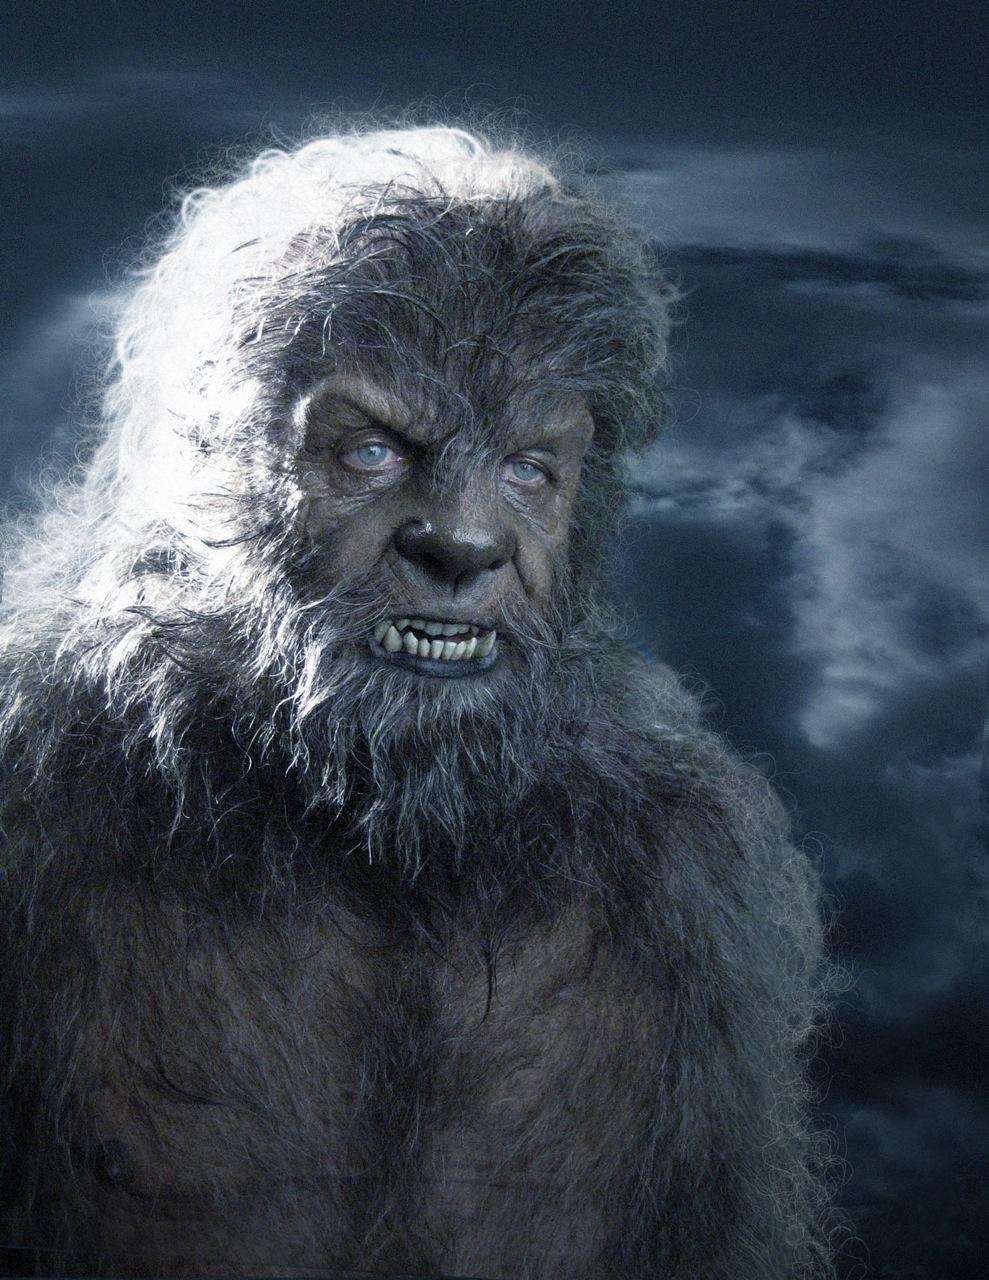 Imagini rezolutie mare The Wolfman (2010) - Imagini Omul ... Anthony Hopkins